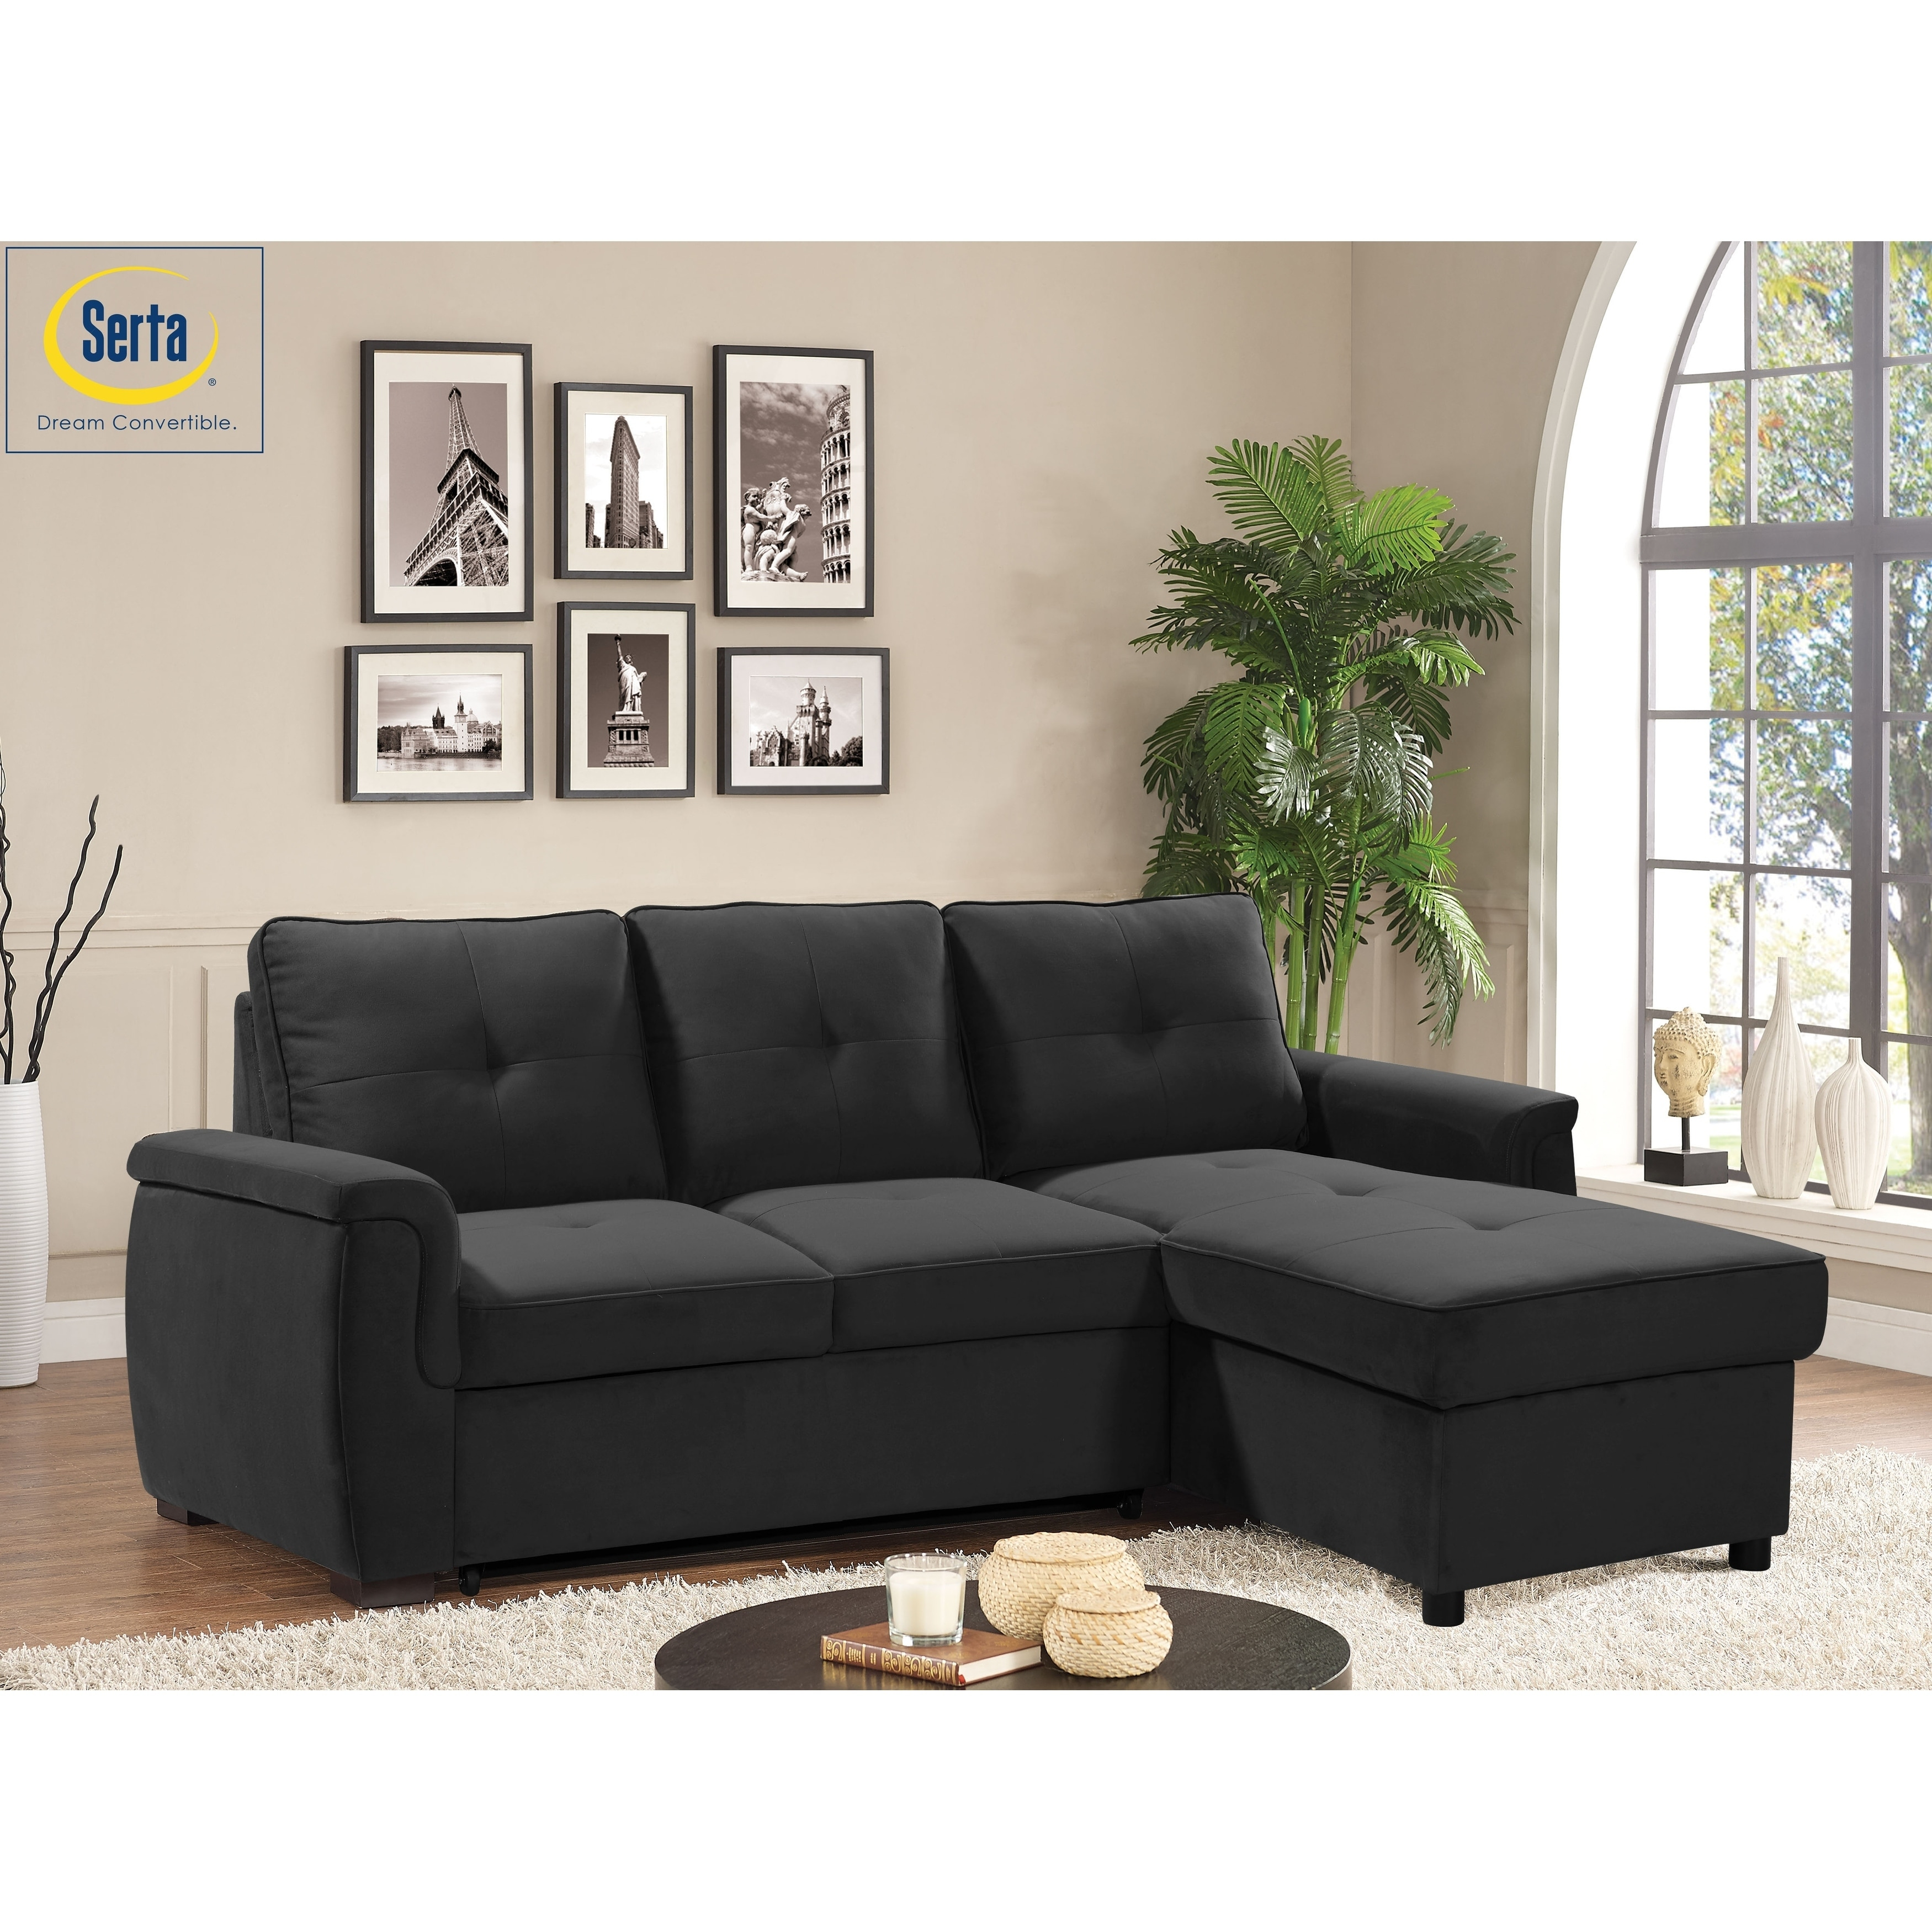 Serta® Lenox Convertible Microfiber Sectional Sofa